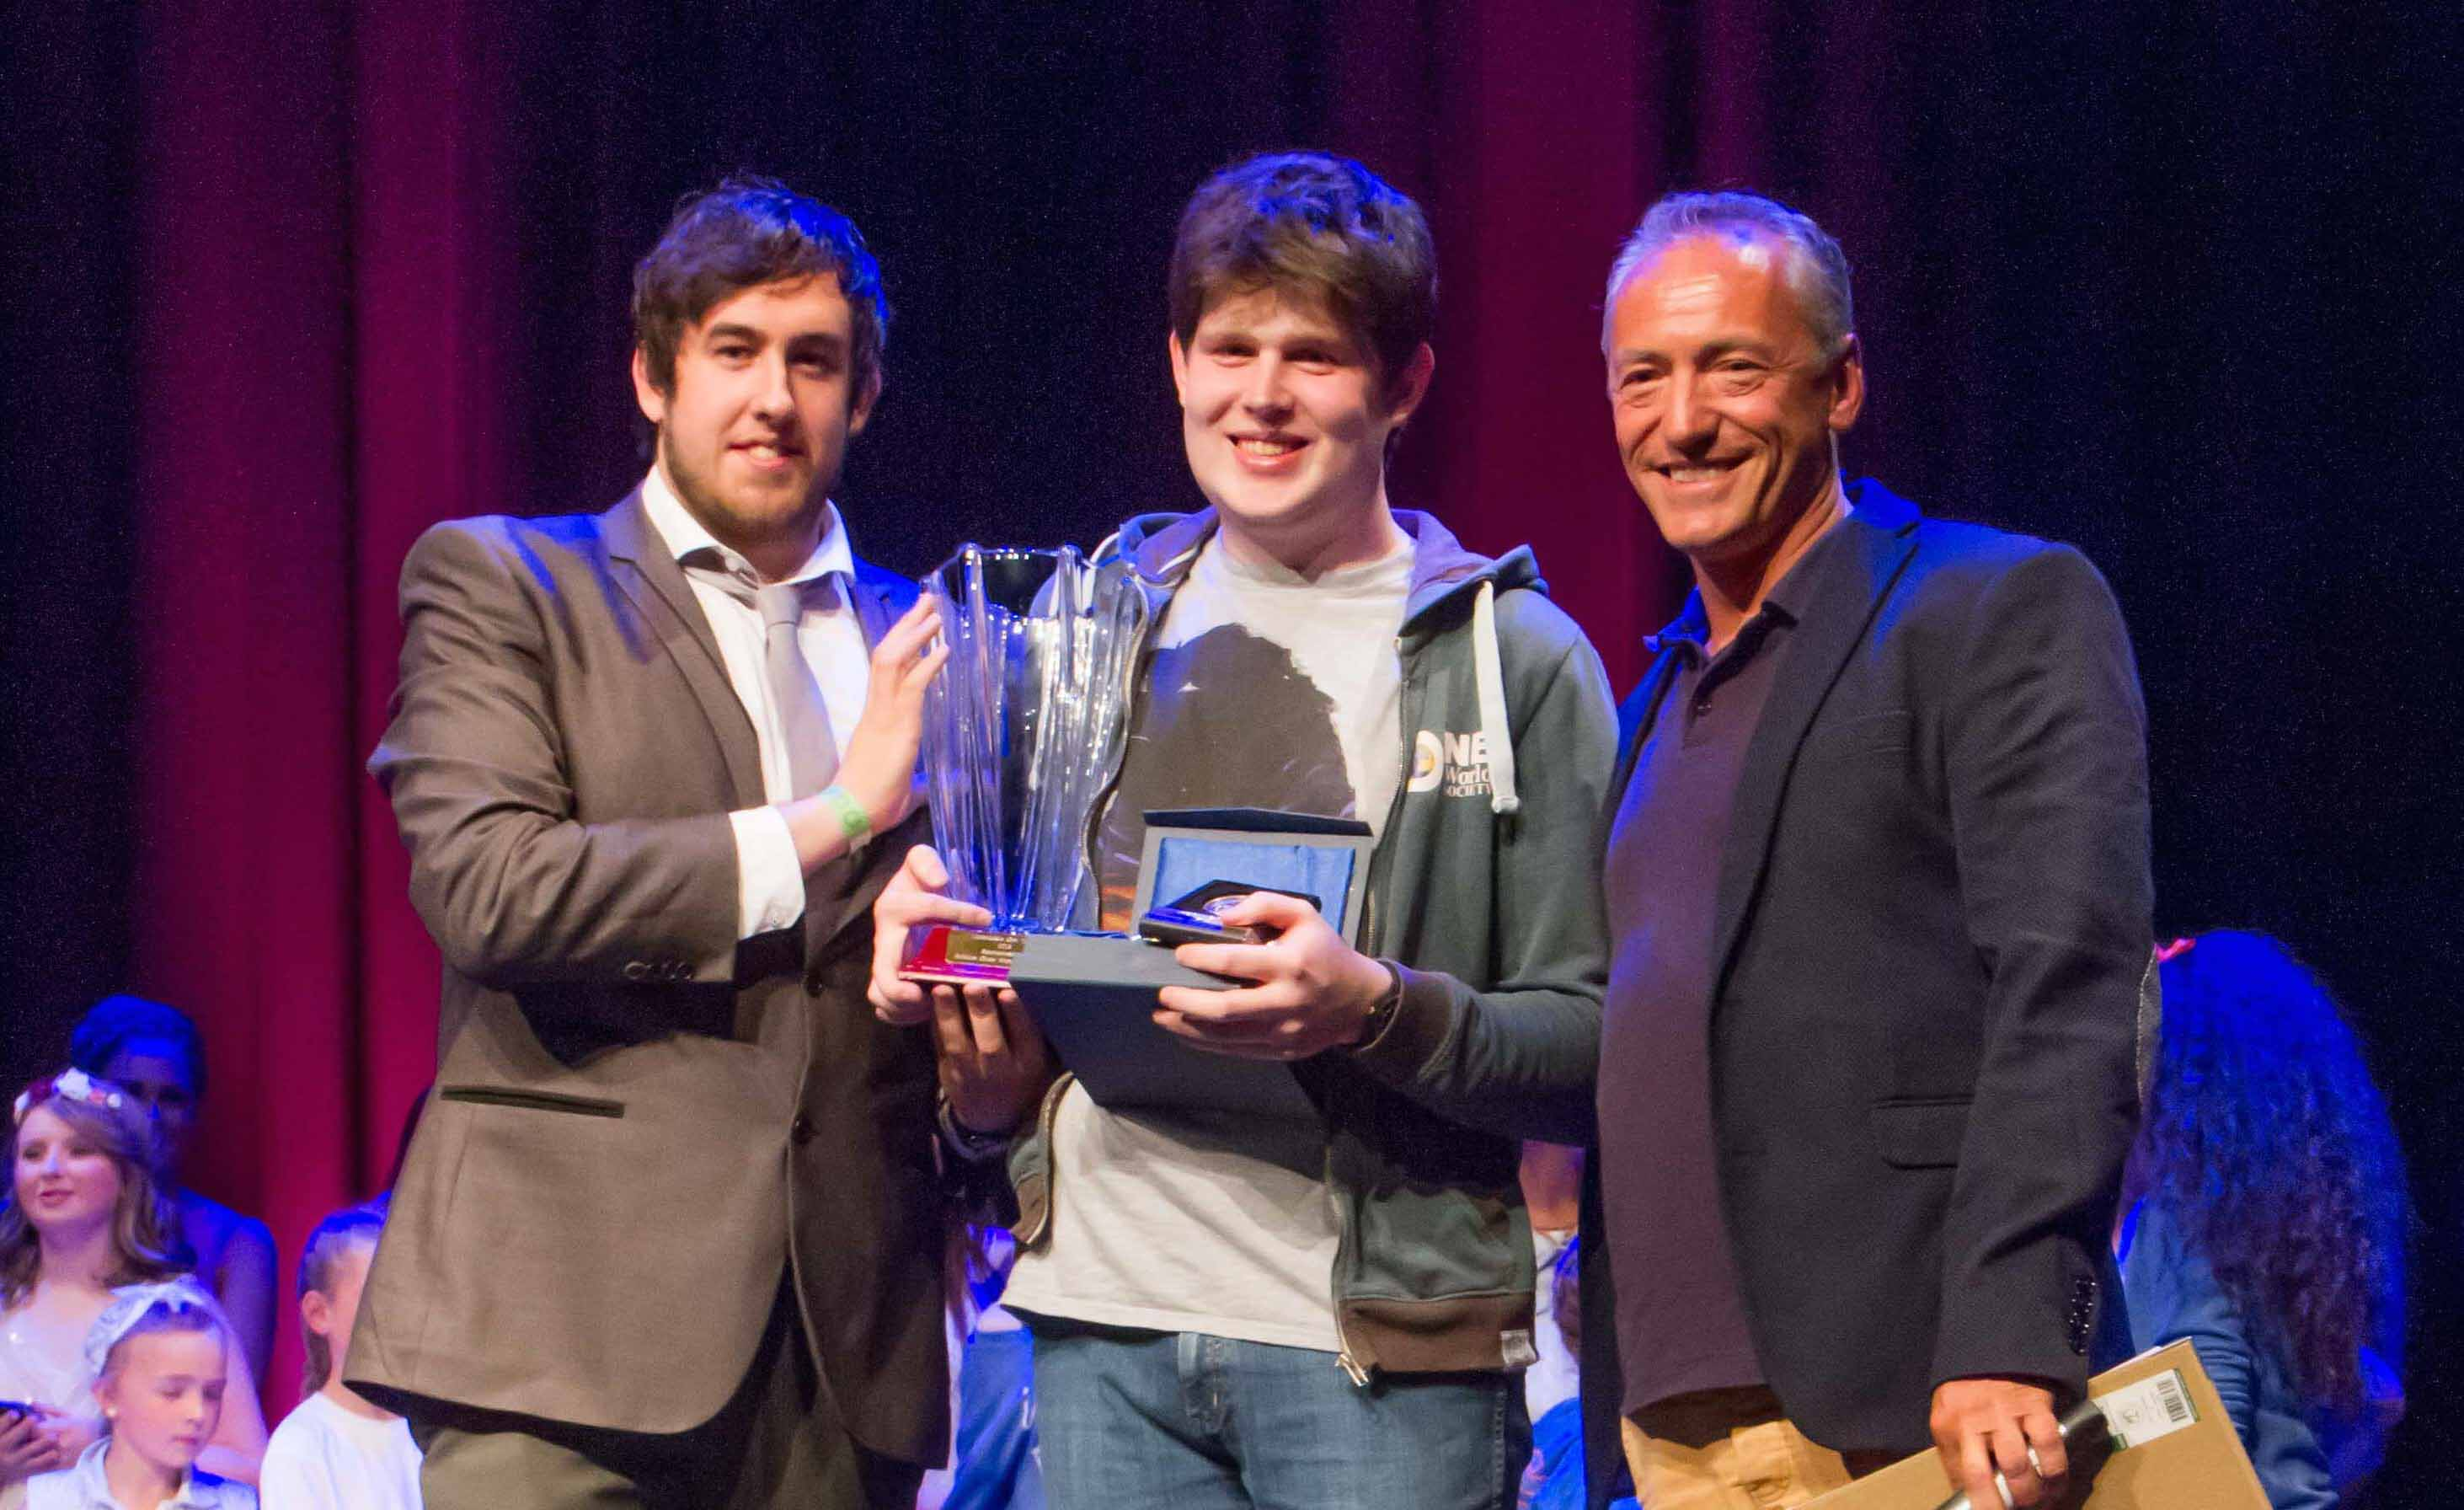 Paul McNamara named Limericks Got Talent 2015 overall winner